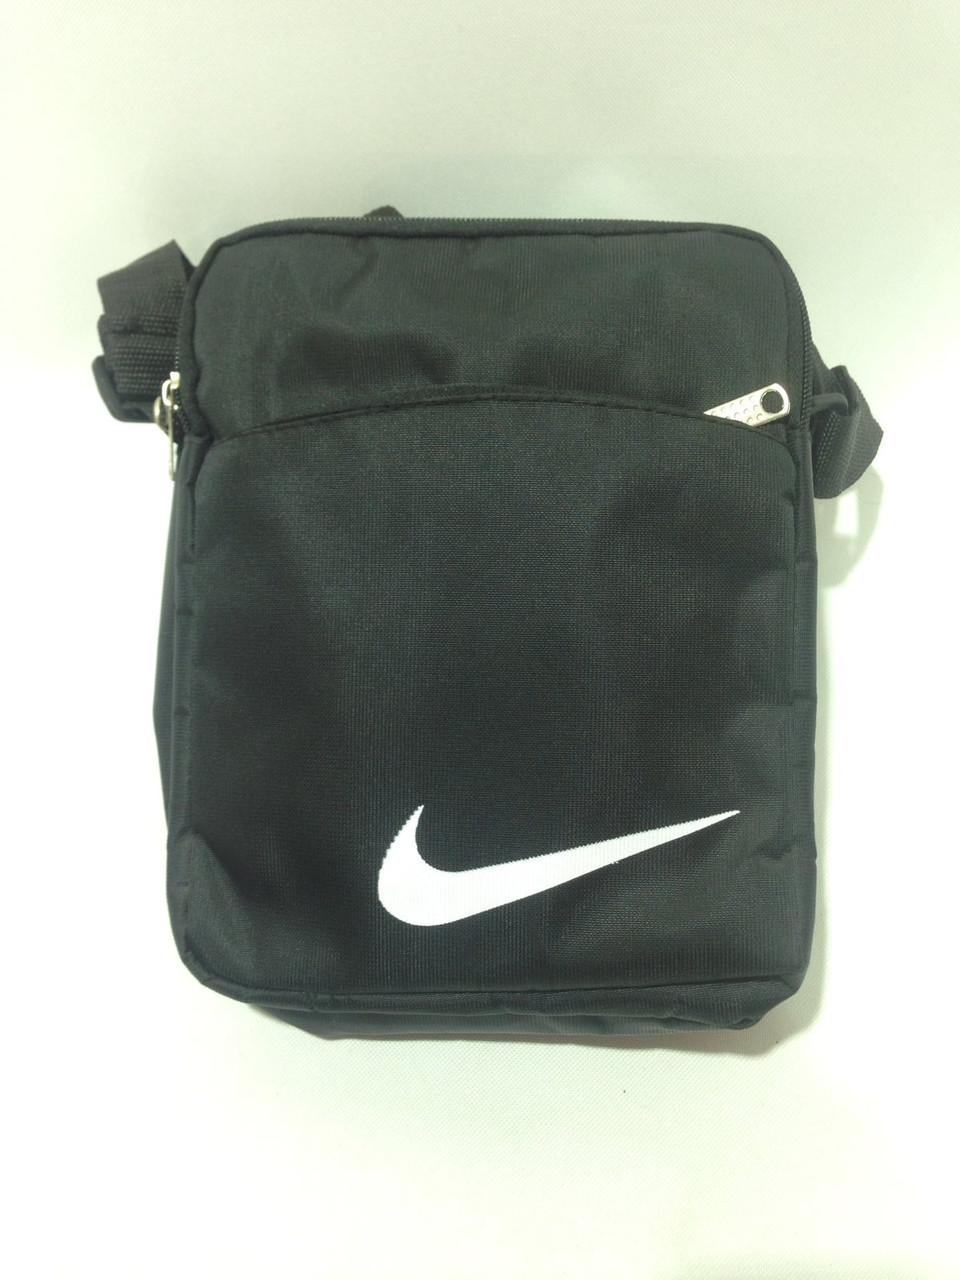 Сумка мужская спортивная через плечо в стиле Nike / черная